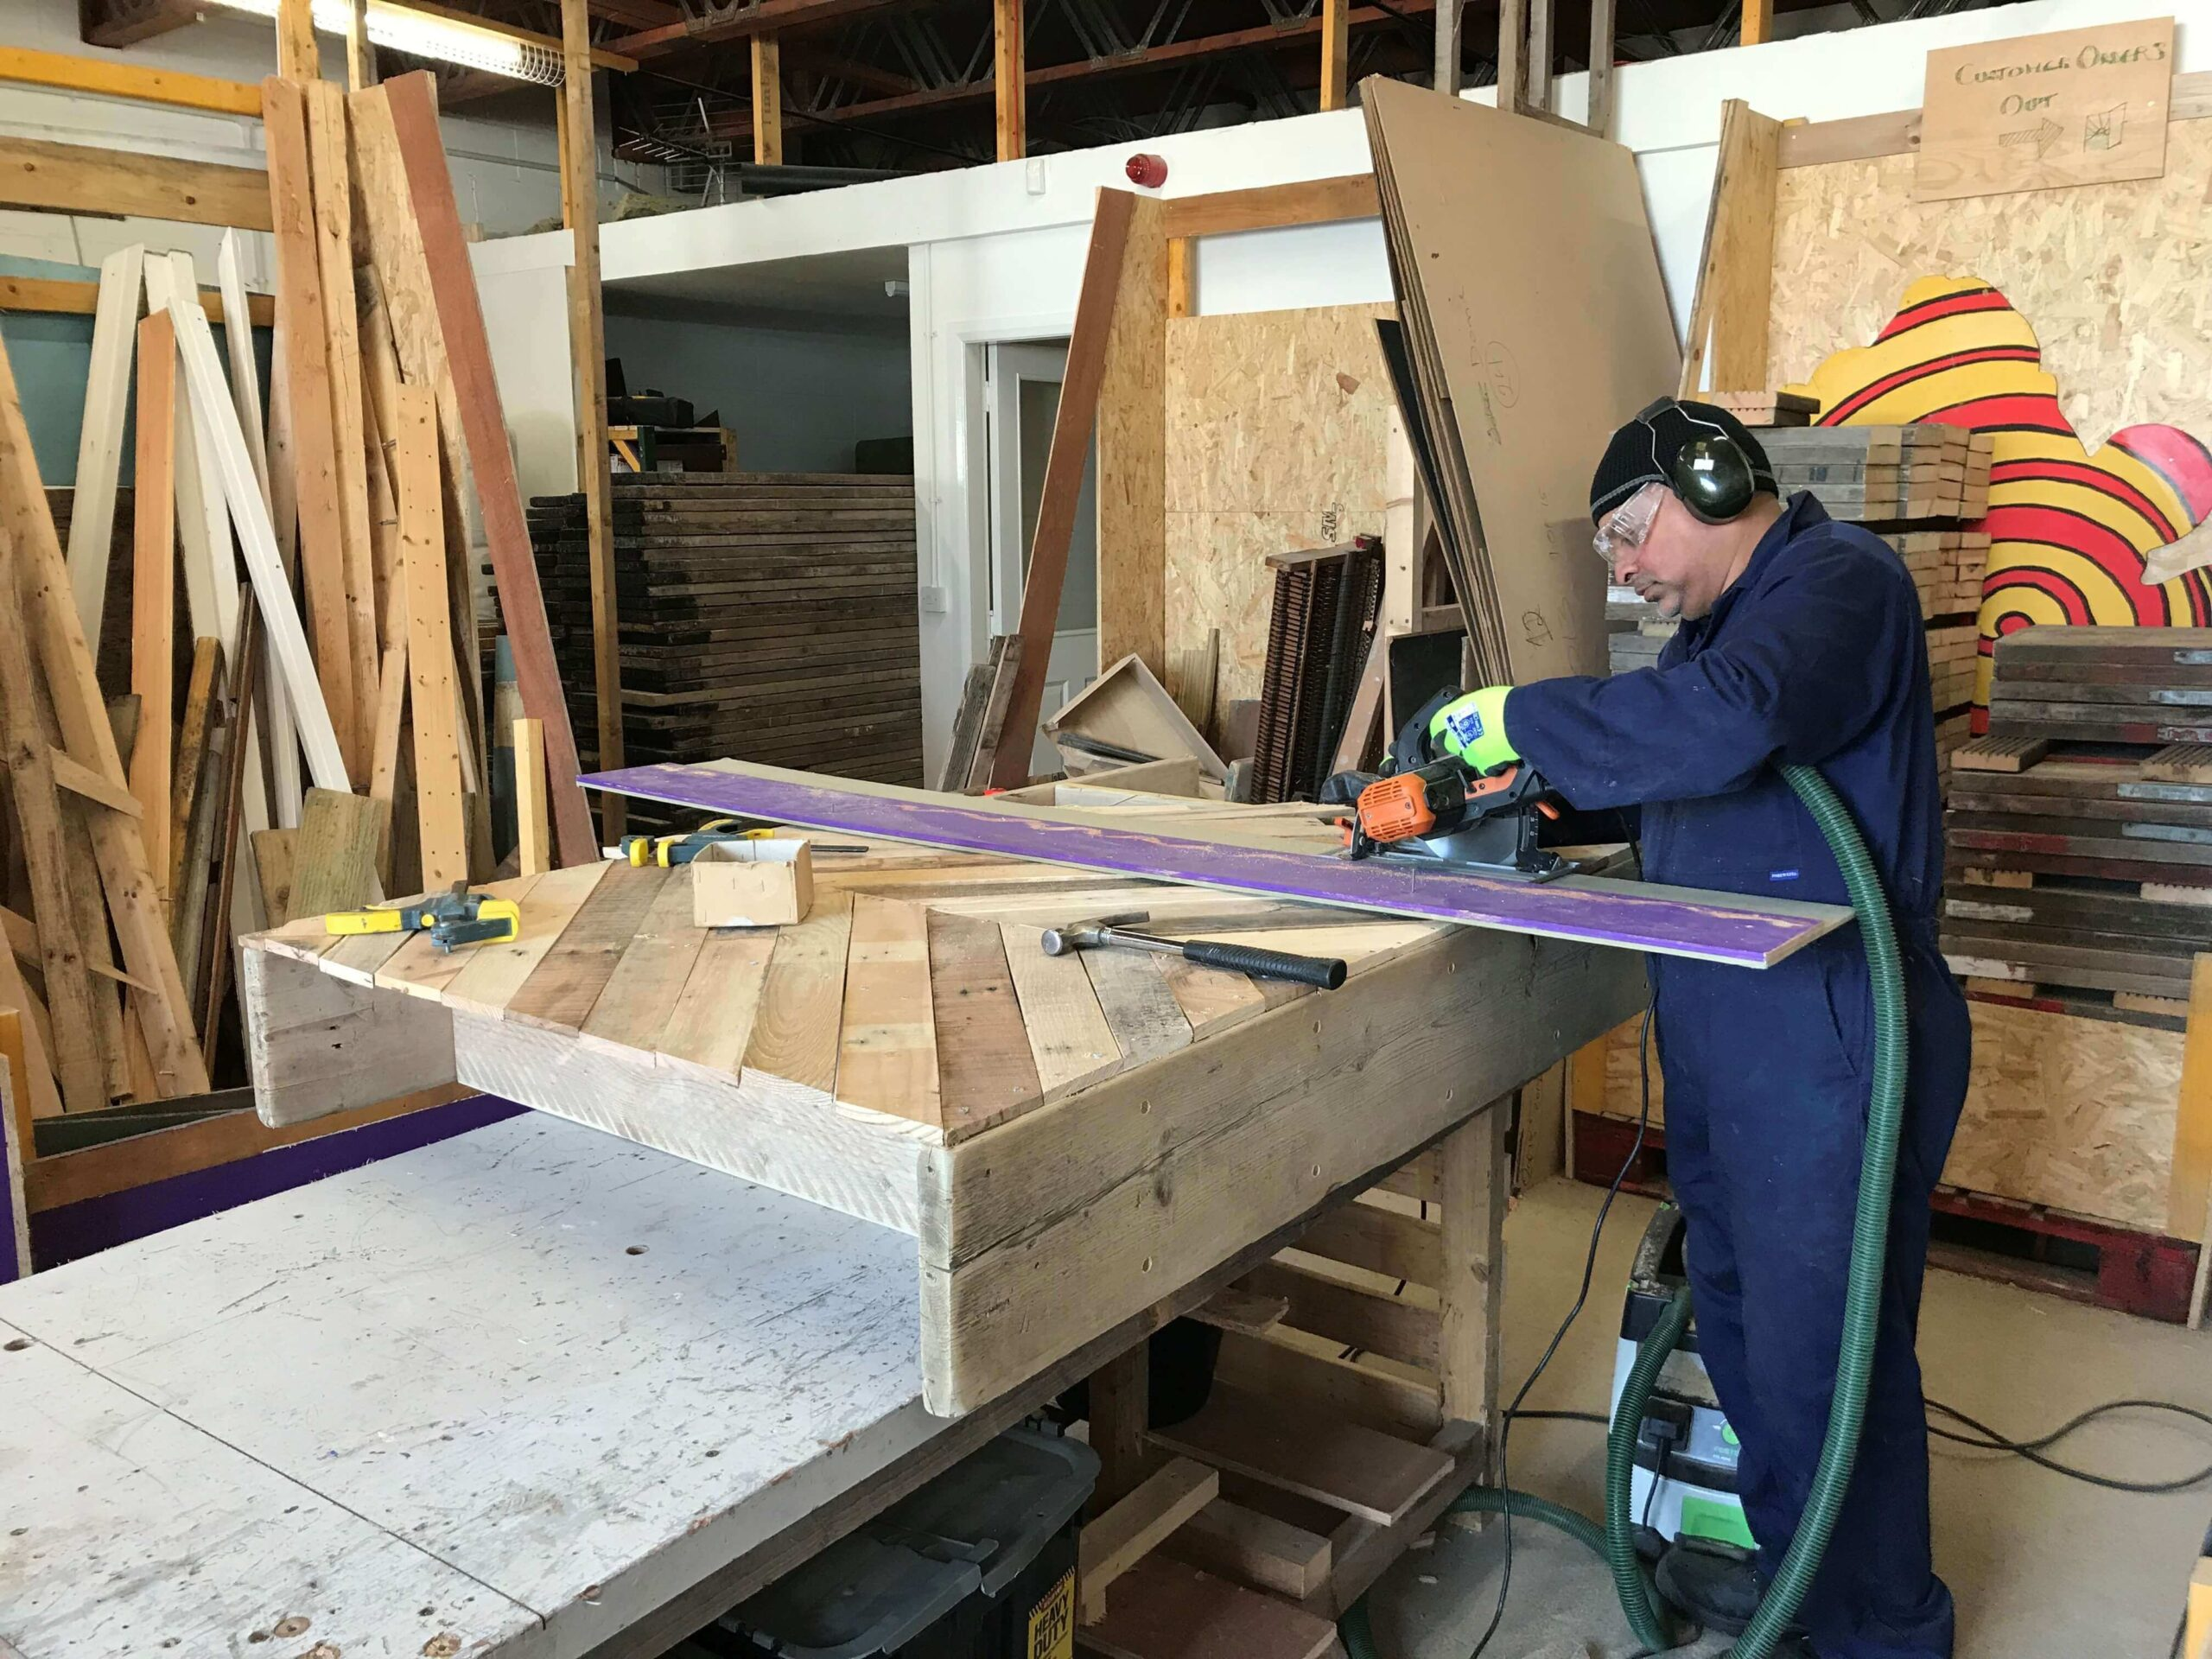 Move On Wood Recycling volunteer Simon